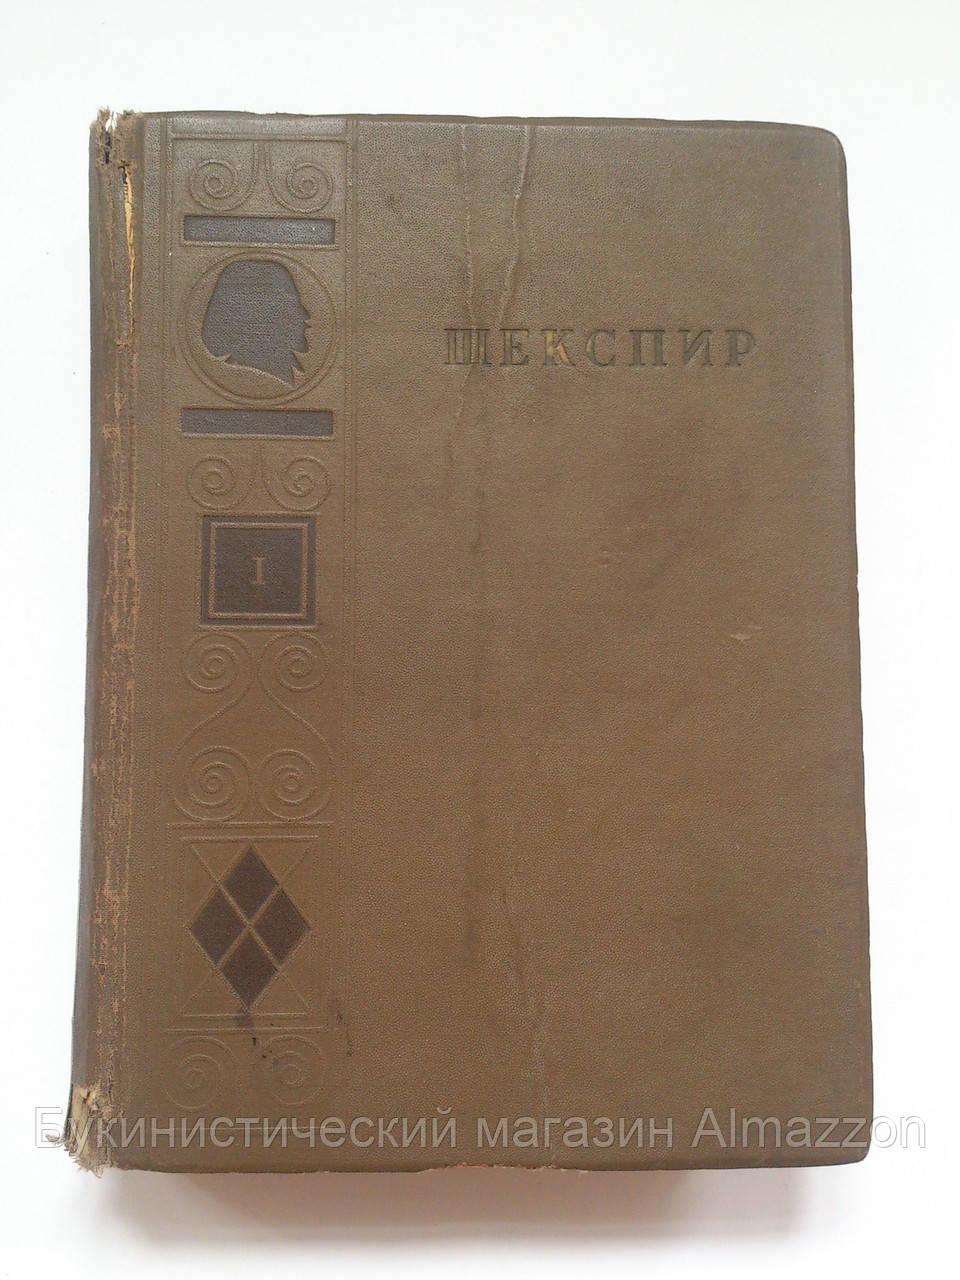 Вильям Шекспир 1937 год 1-й том ACADEMIA